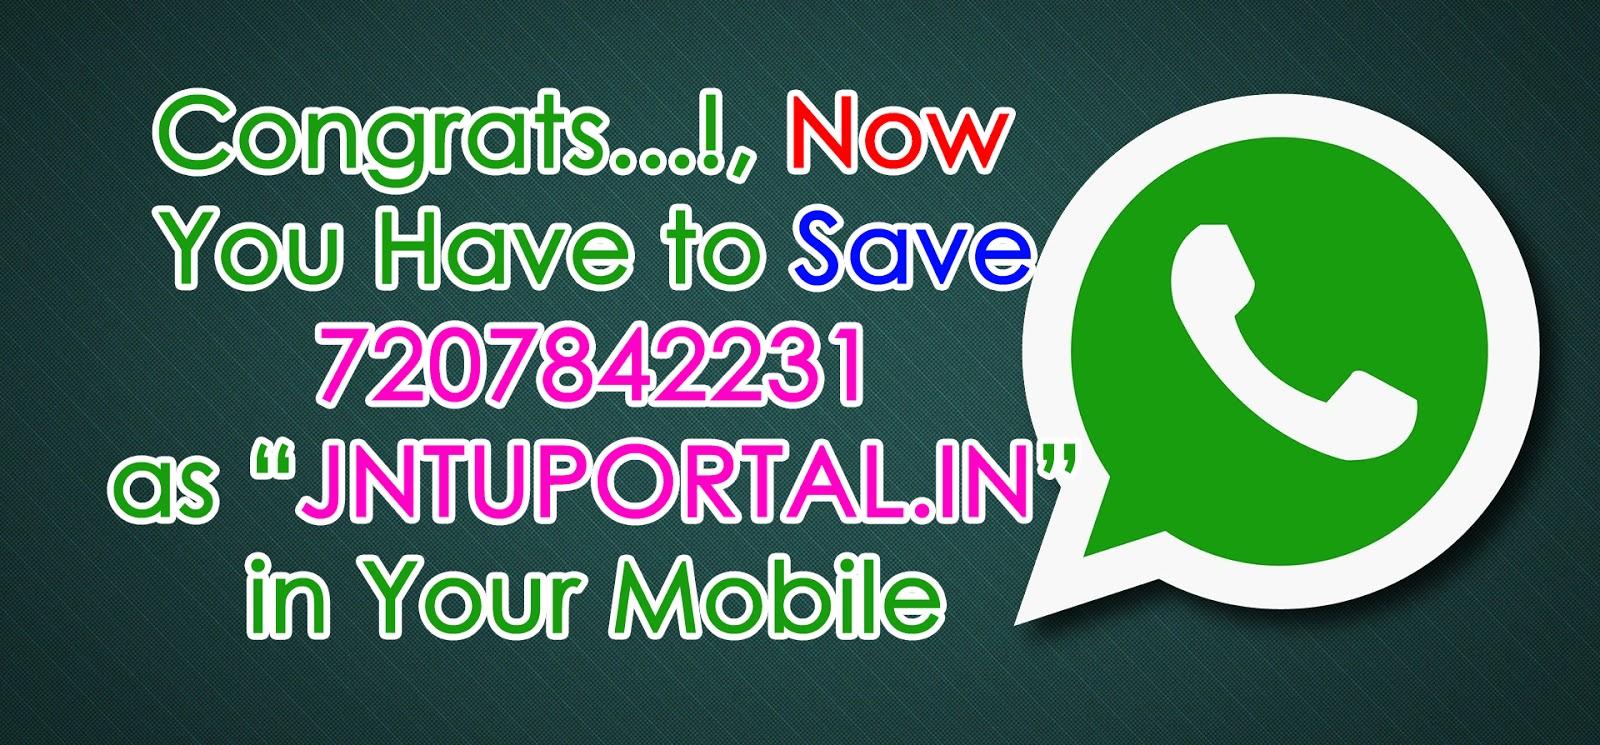 JNTU PORTAL Step2 : WhatsApp Updates